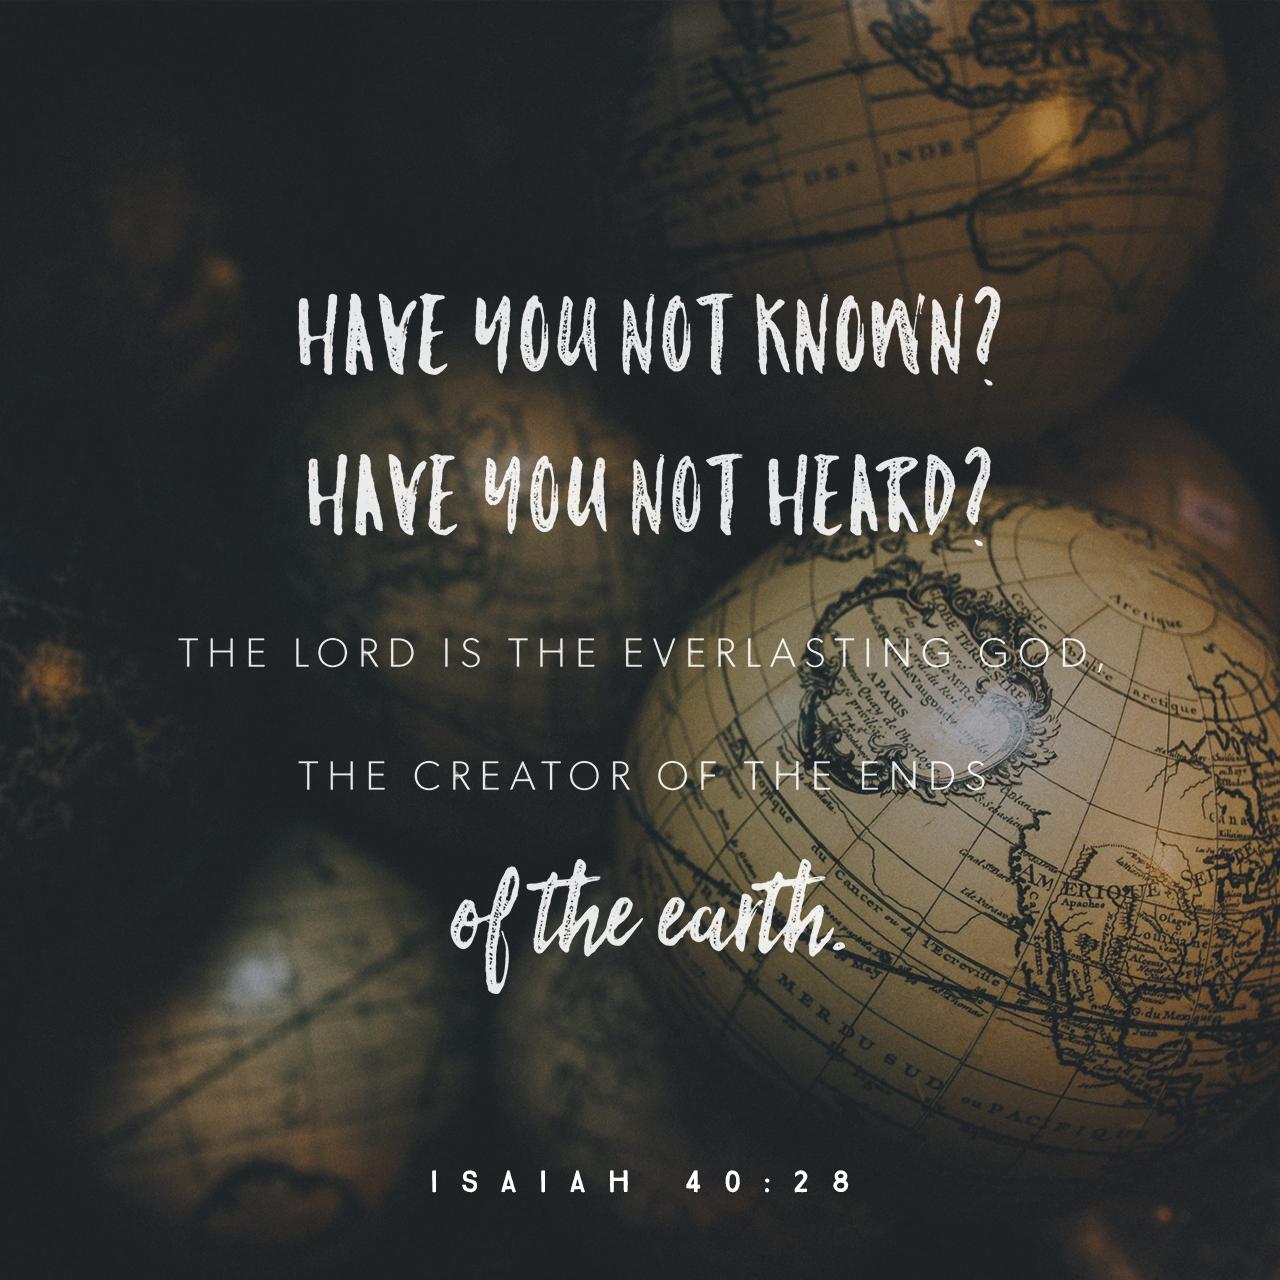 Isaiah 40:28